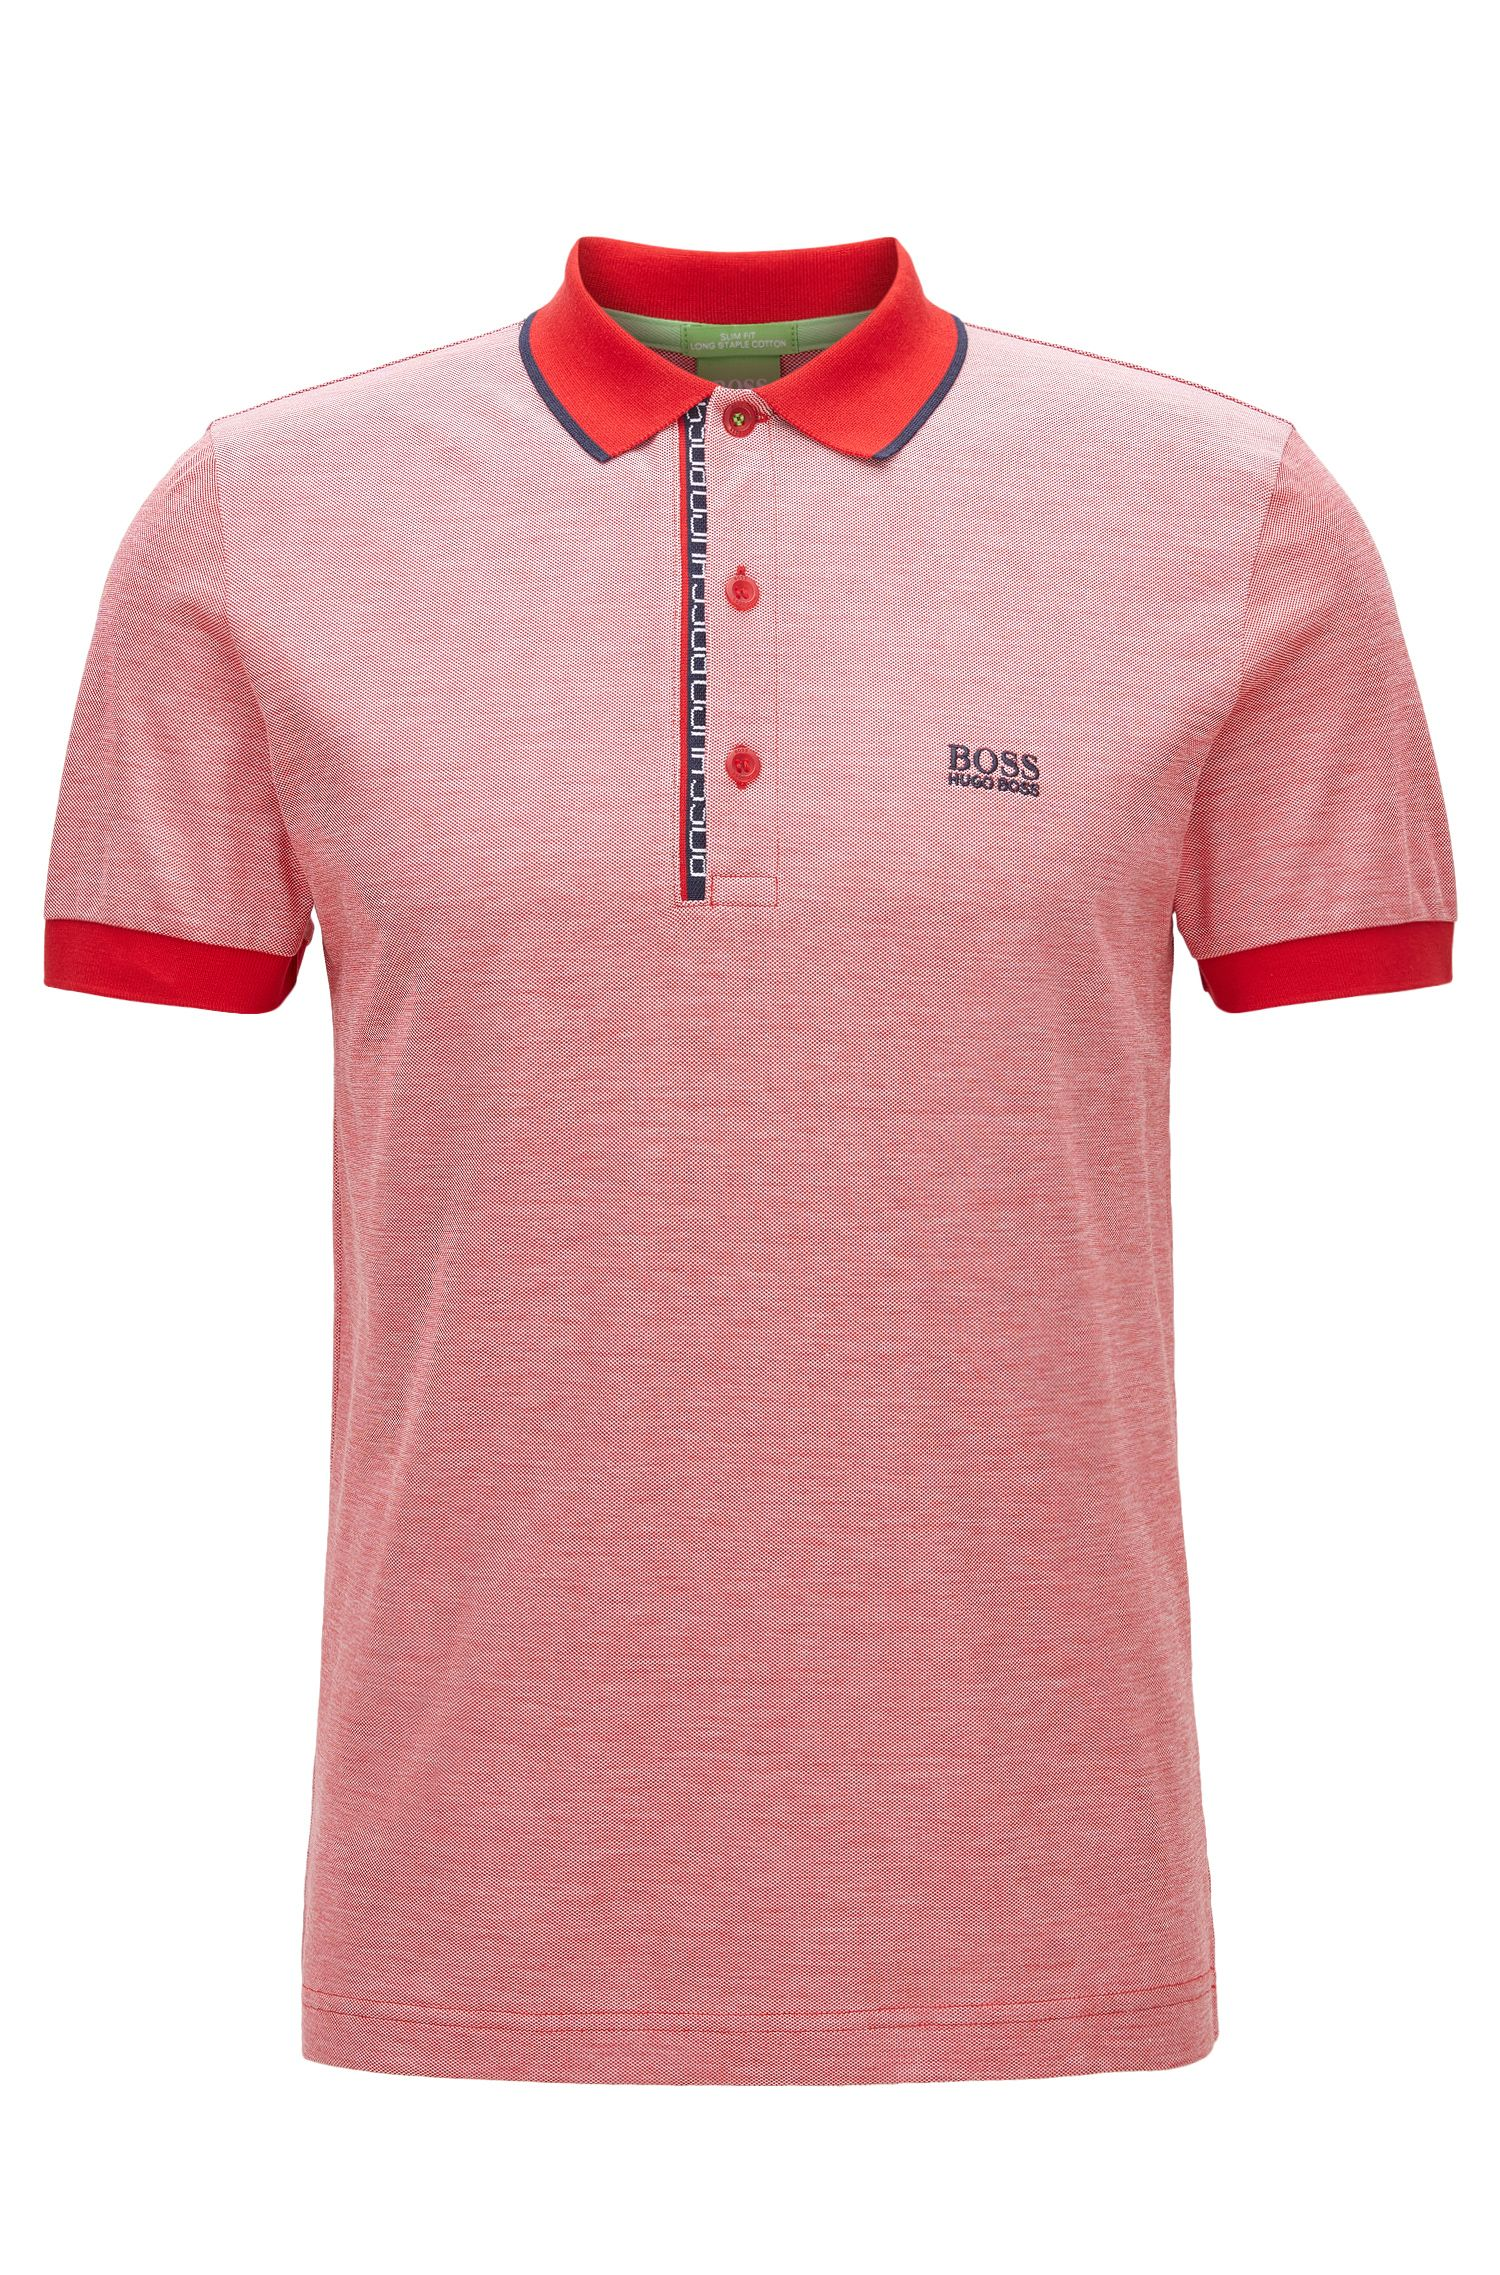 'Paule' | Slim Fit, Oxfotd Cotton Polo Shirt